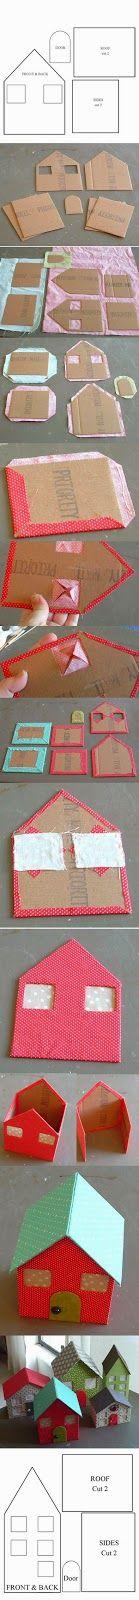 casa-juguete-carton-muy-ingenioso-1-diy+(2).jpg (139×1600)